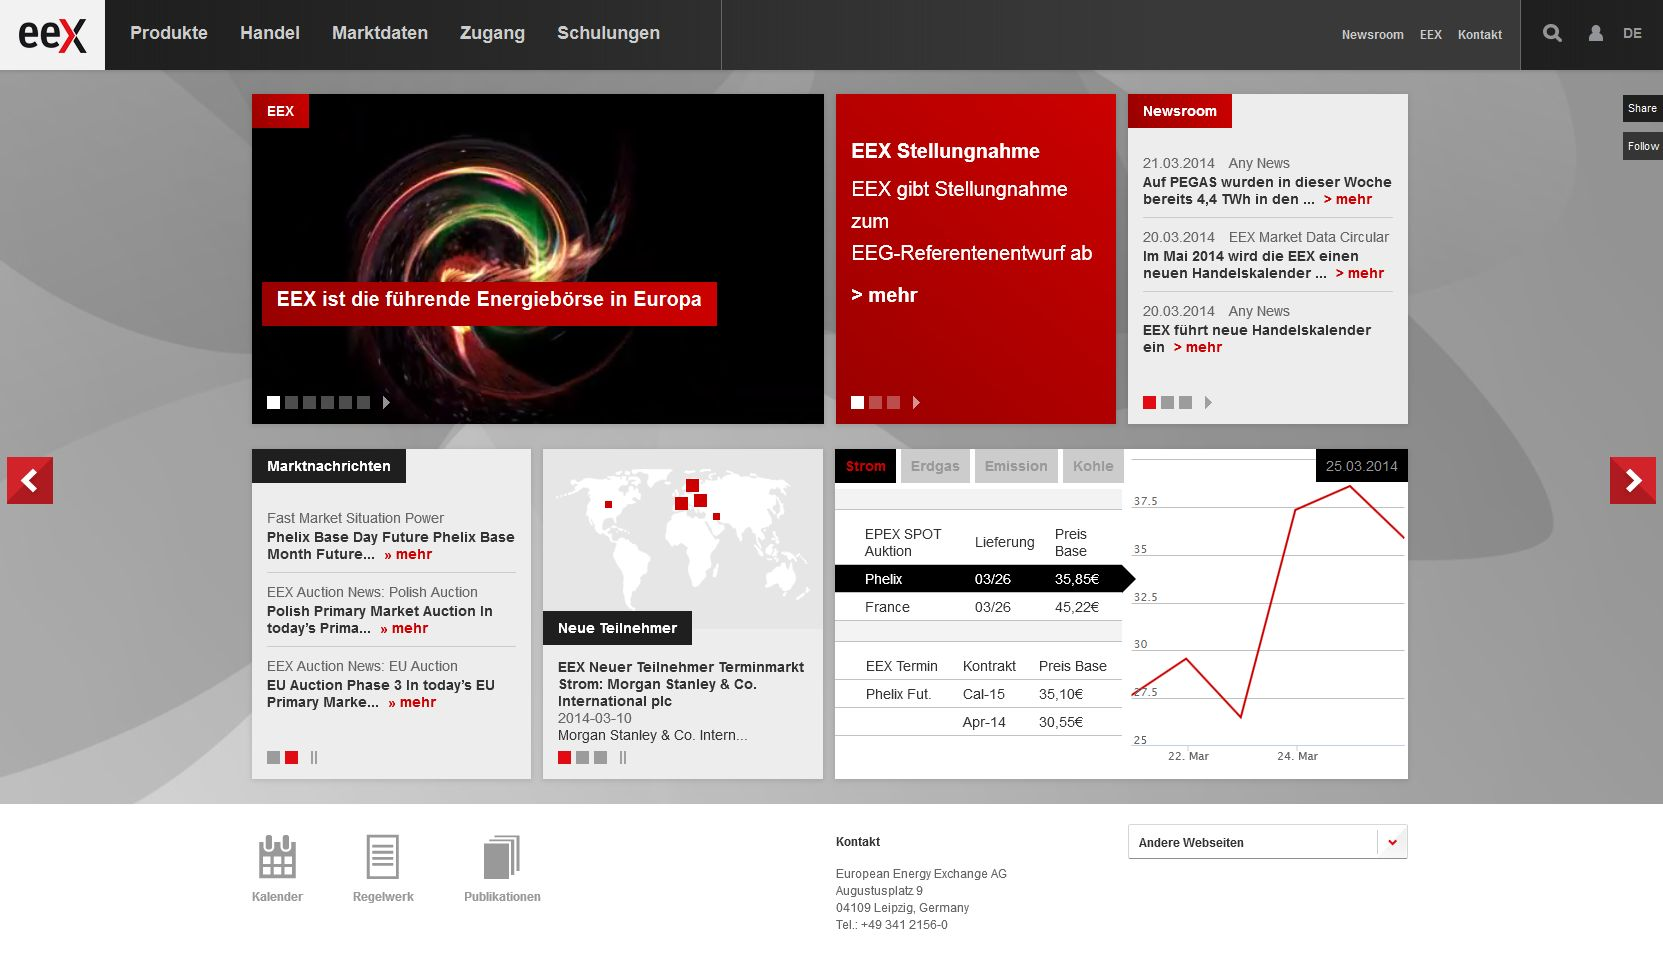 Screenshot www.eex.com/de